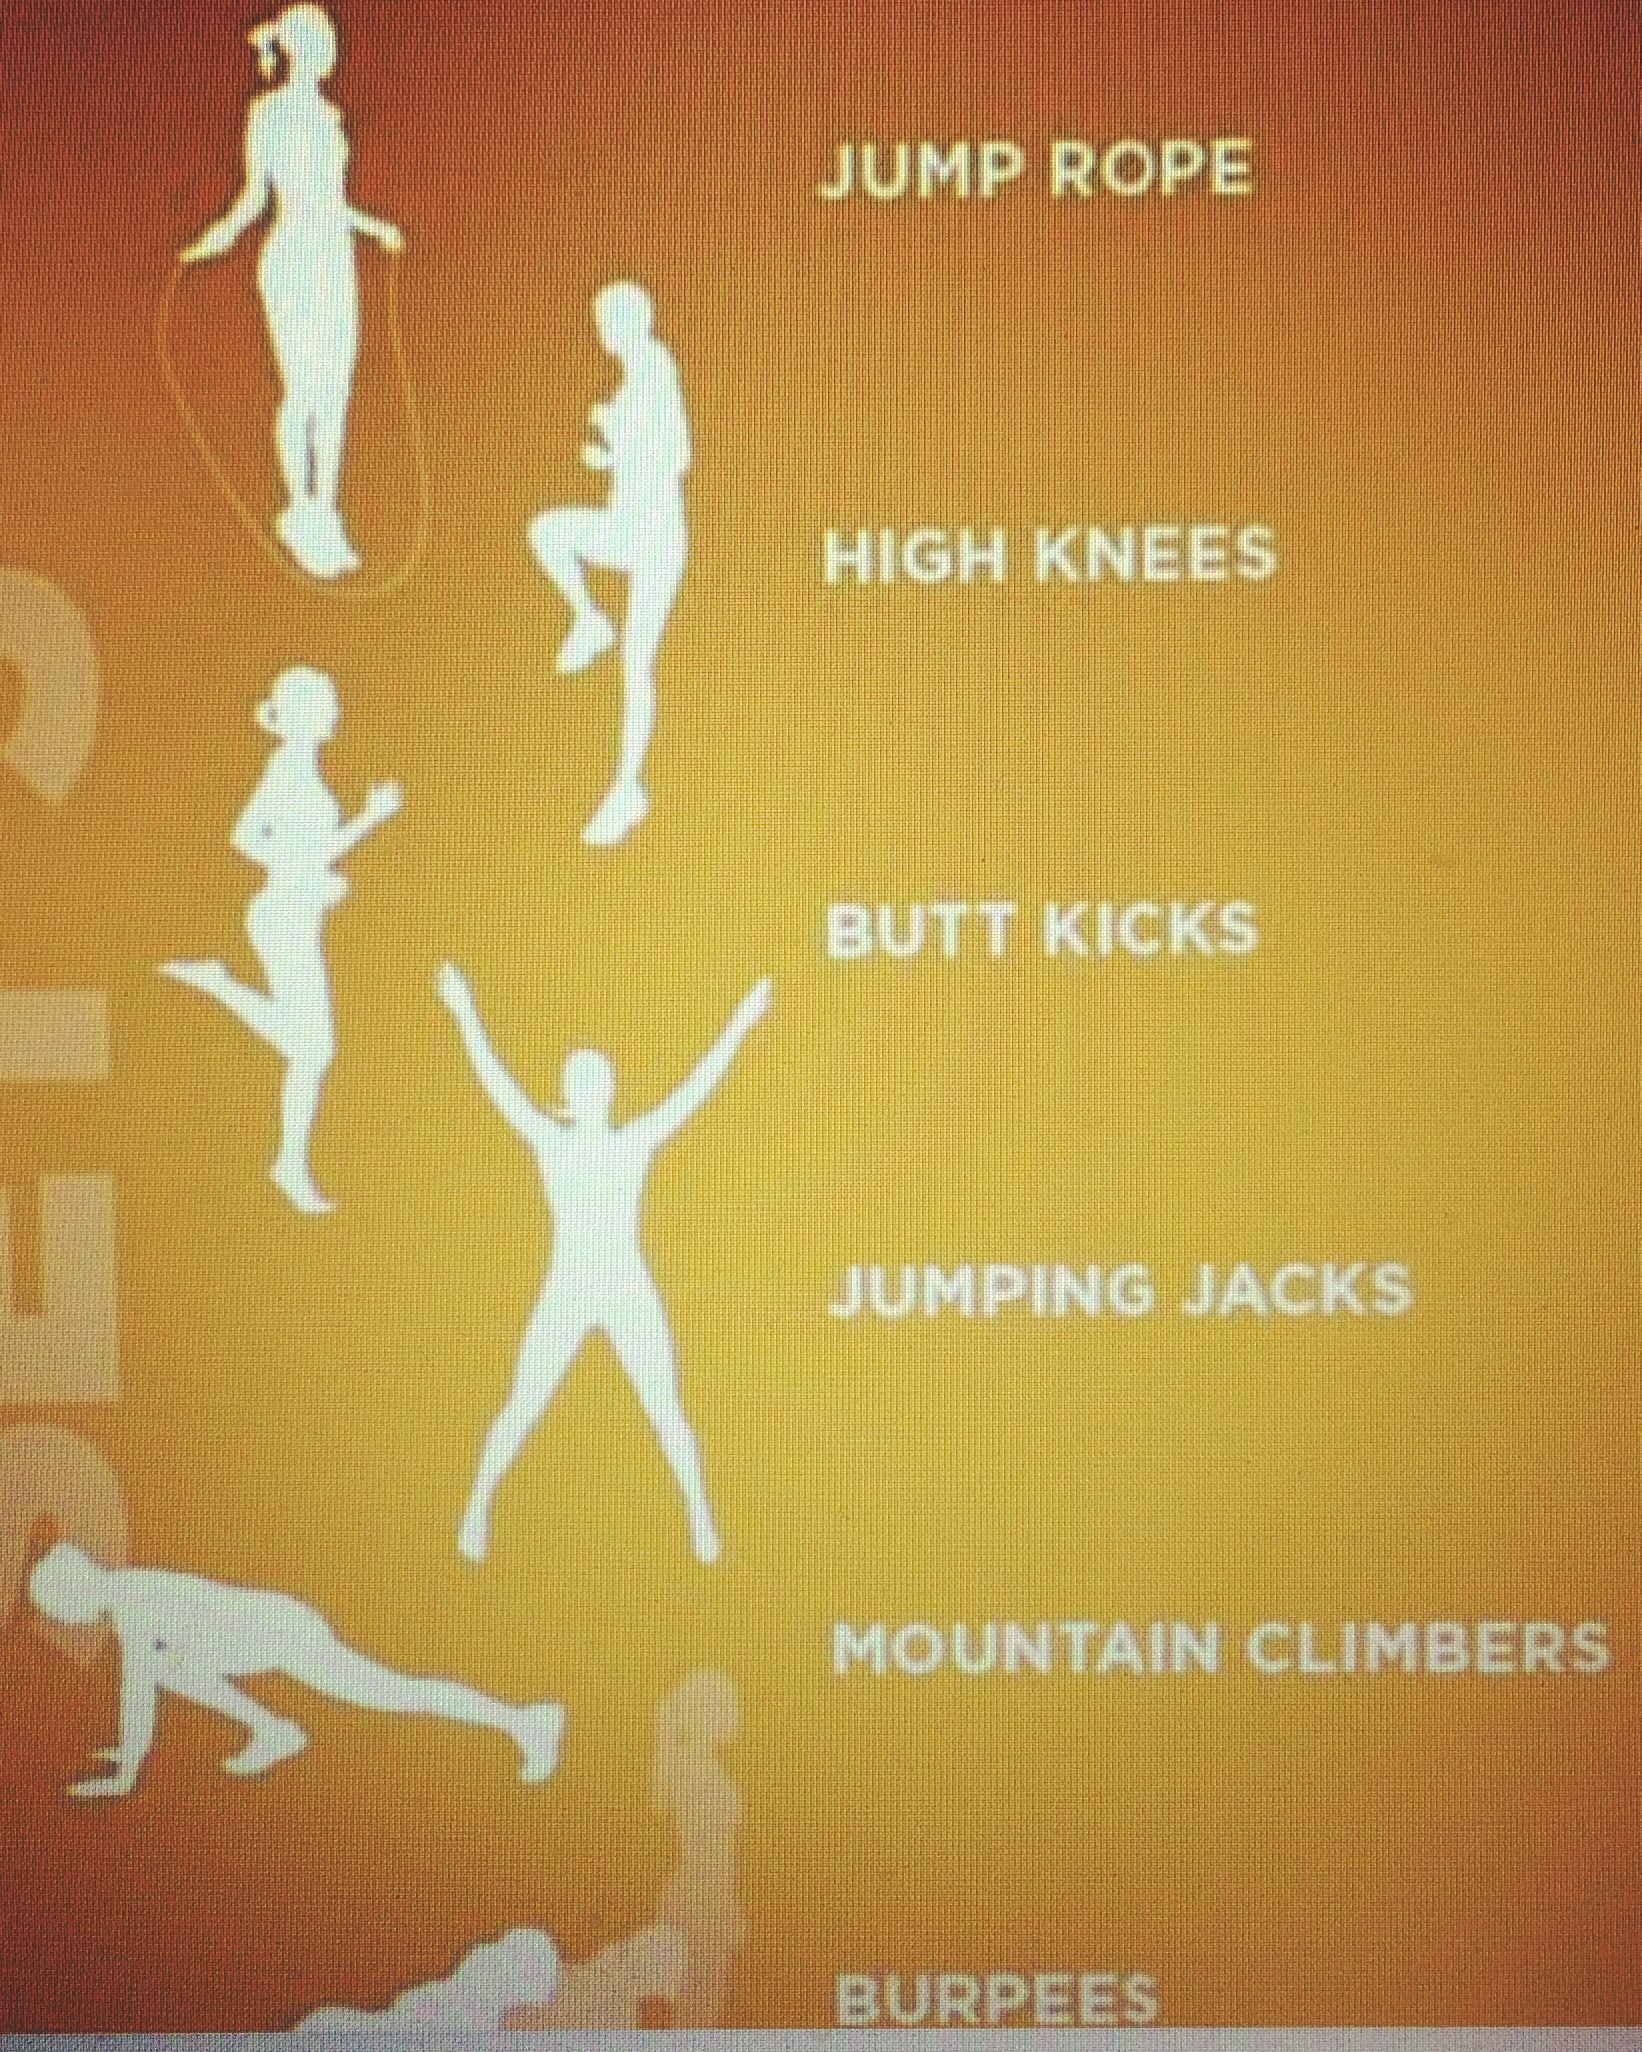 6 Examples Of Vigorous Aerobic Exercises I Have 4 Easy To Follow